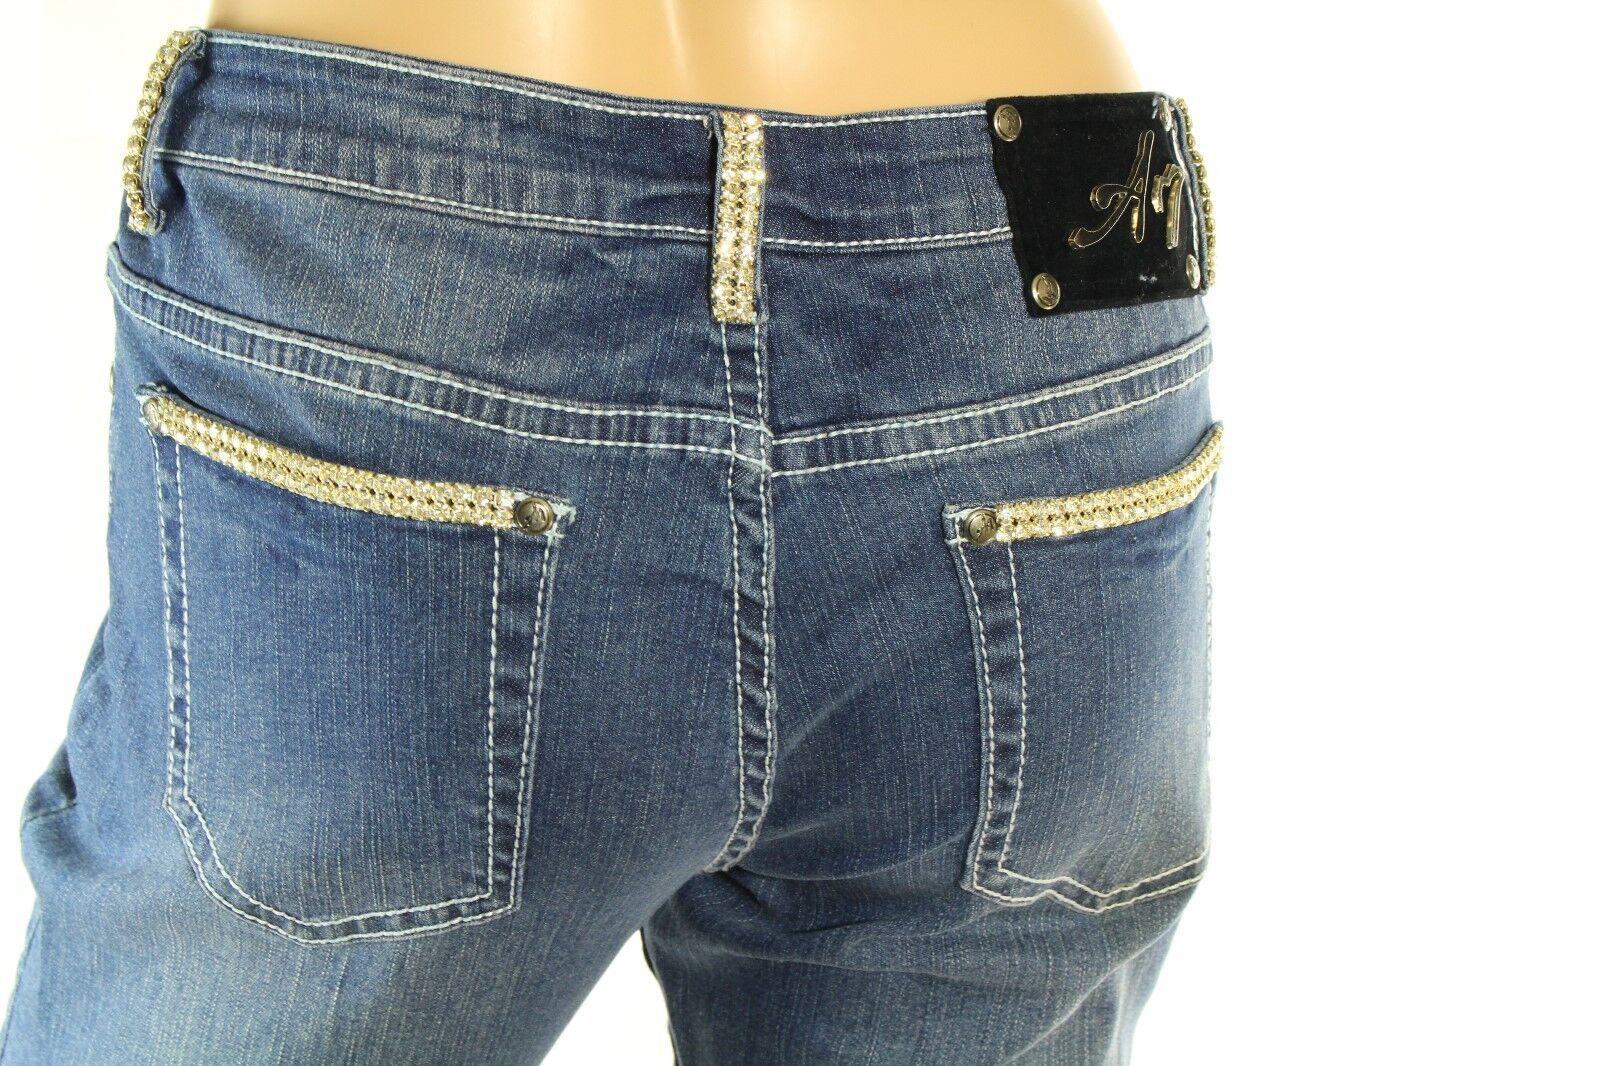 A7 Women's Denim Embellished Distressed Skinny Stretch Swarovski Crystal Jeans